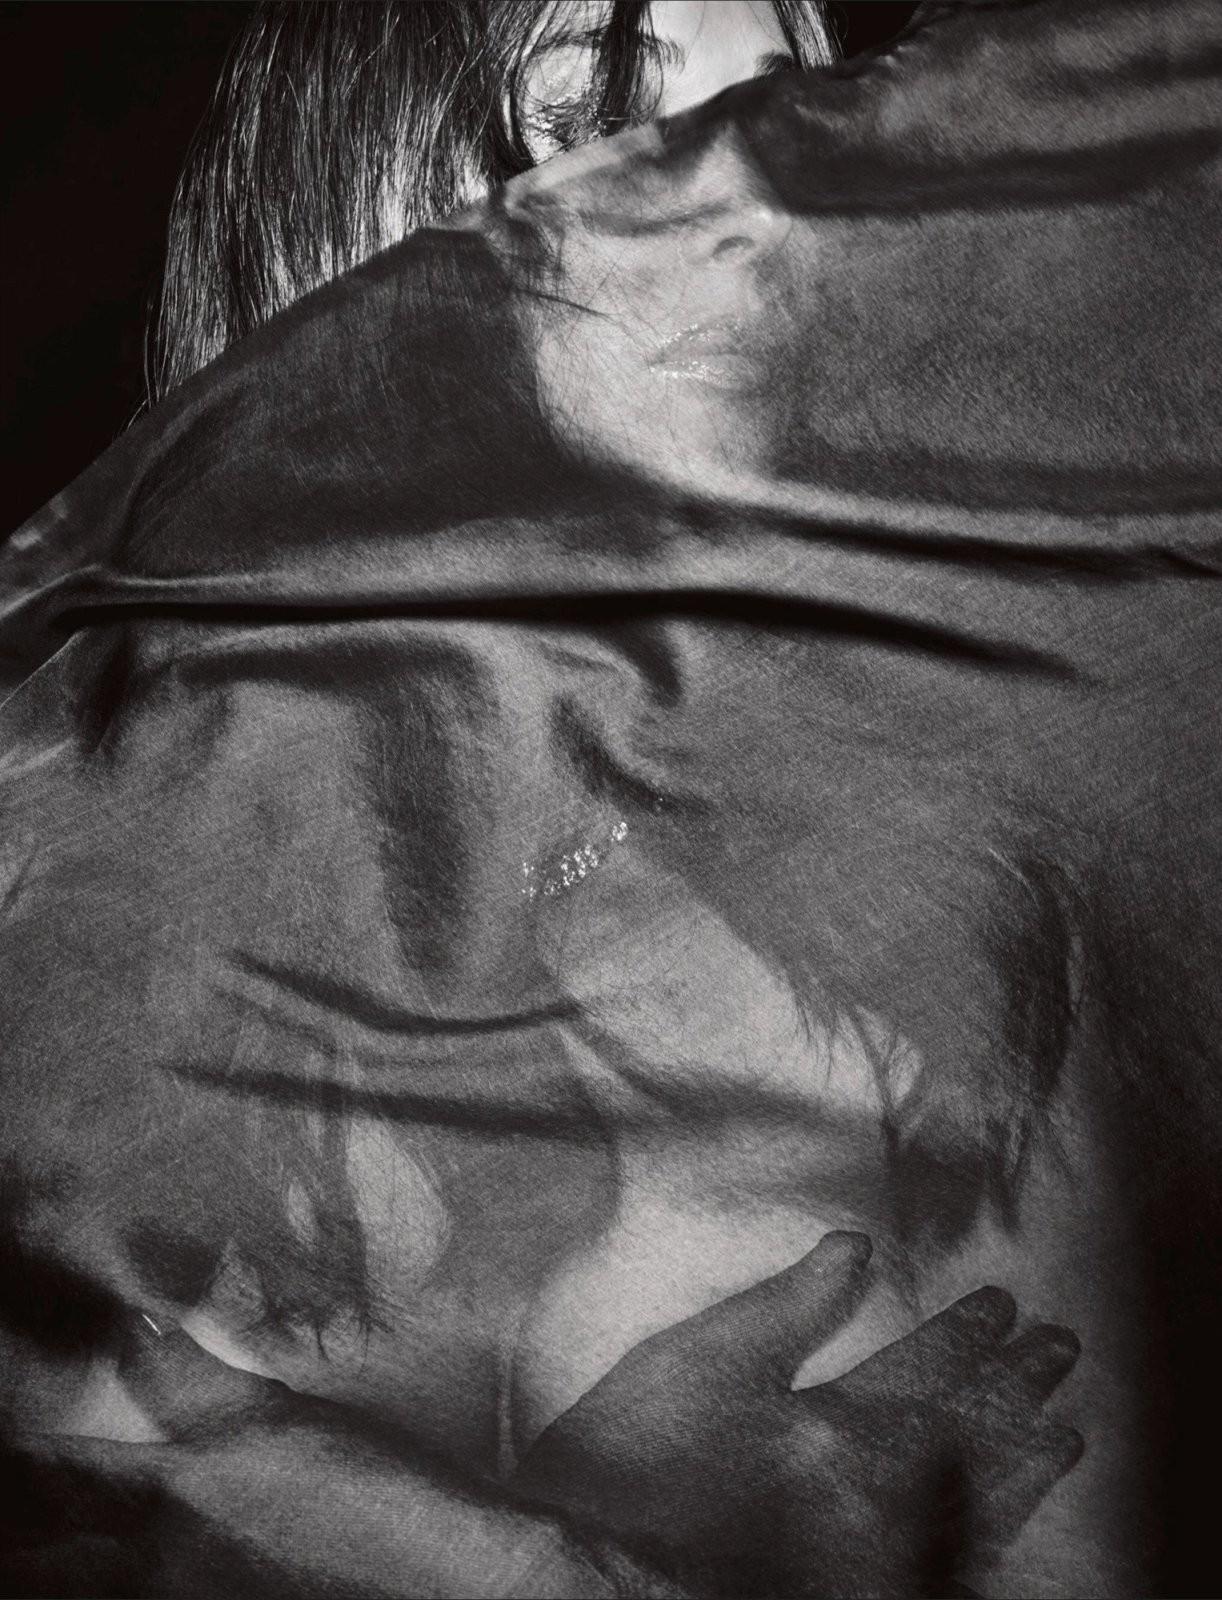 Monica Bellucci porno famosas desnudas